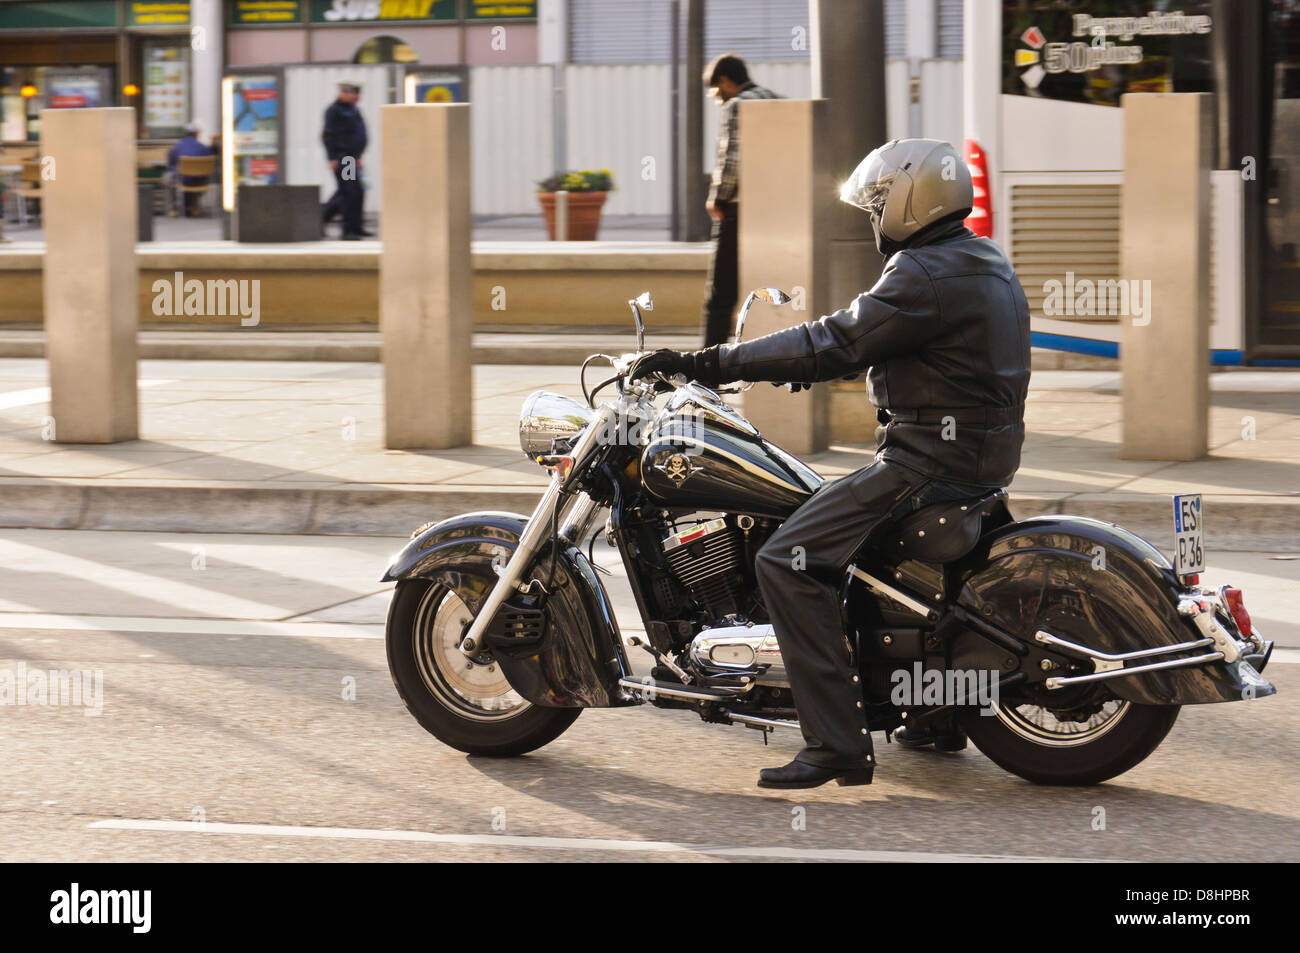 Biker in black motorcycle clothing and gray helmet, riding a heavy black Kawasaki Drifter motorbike – Heilbronn - Stock Image